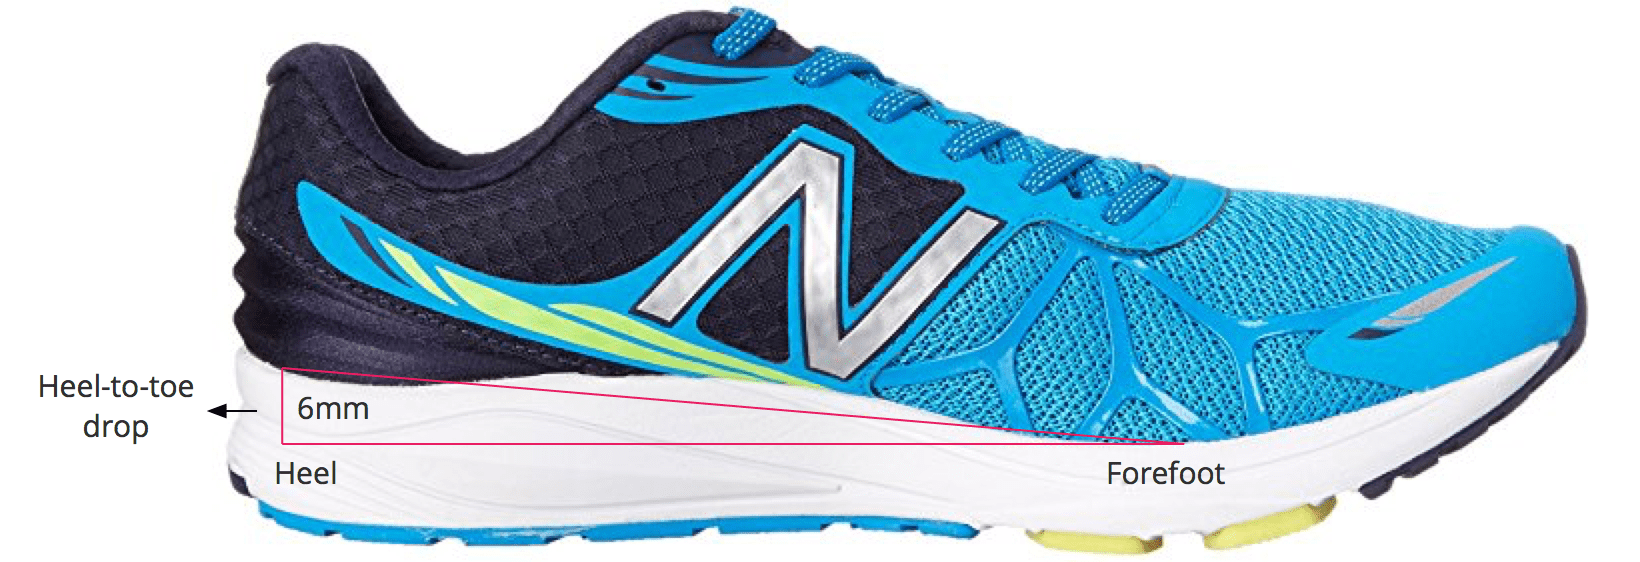 Most common heel to toe drop